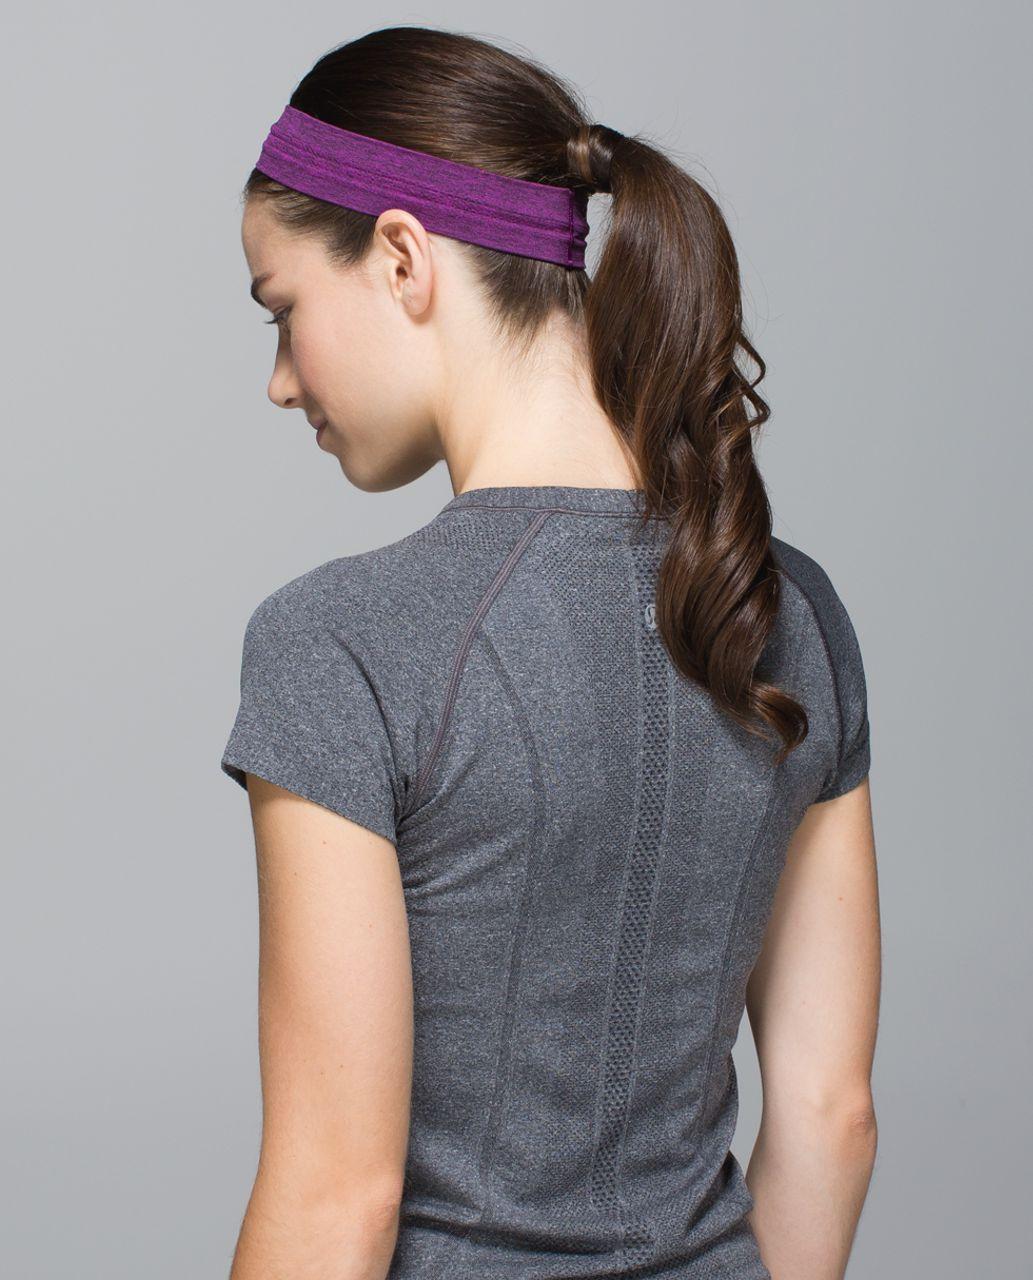 Lululemon Swiftly Headband - Heathered Ultra Violet / Black